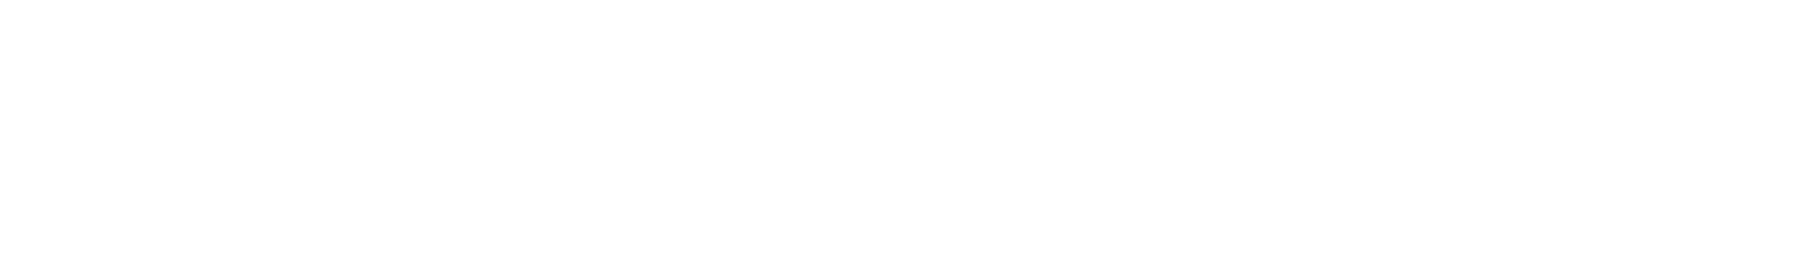 g abs05 064